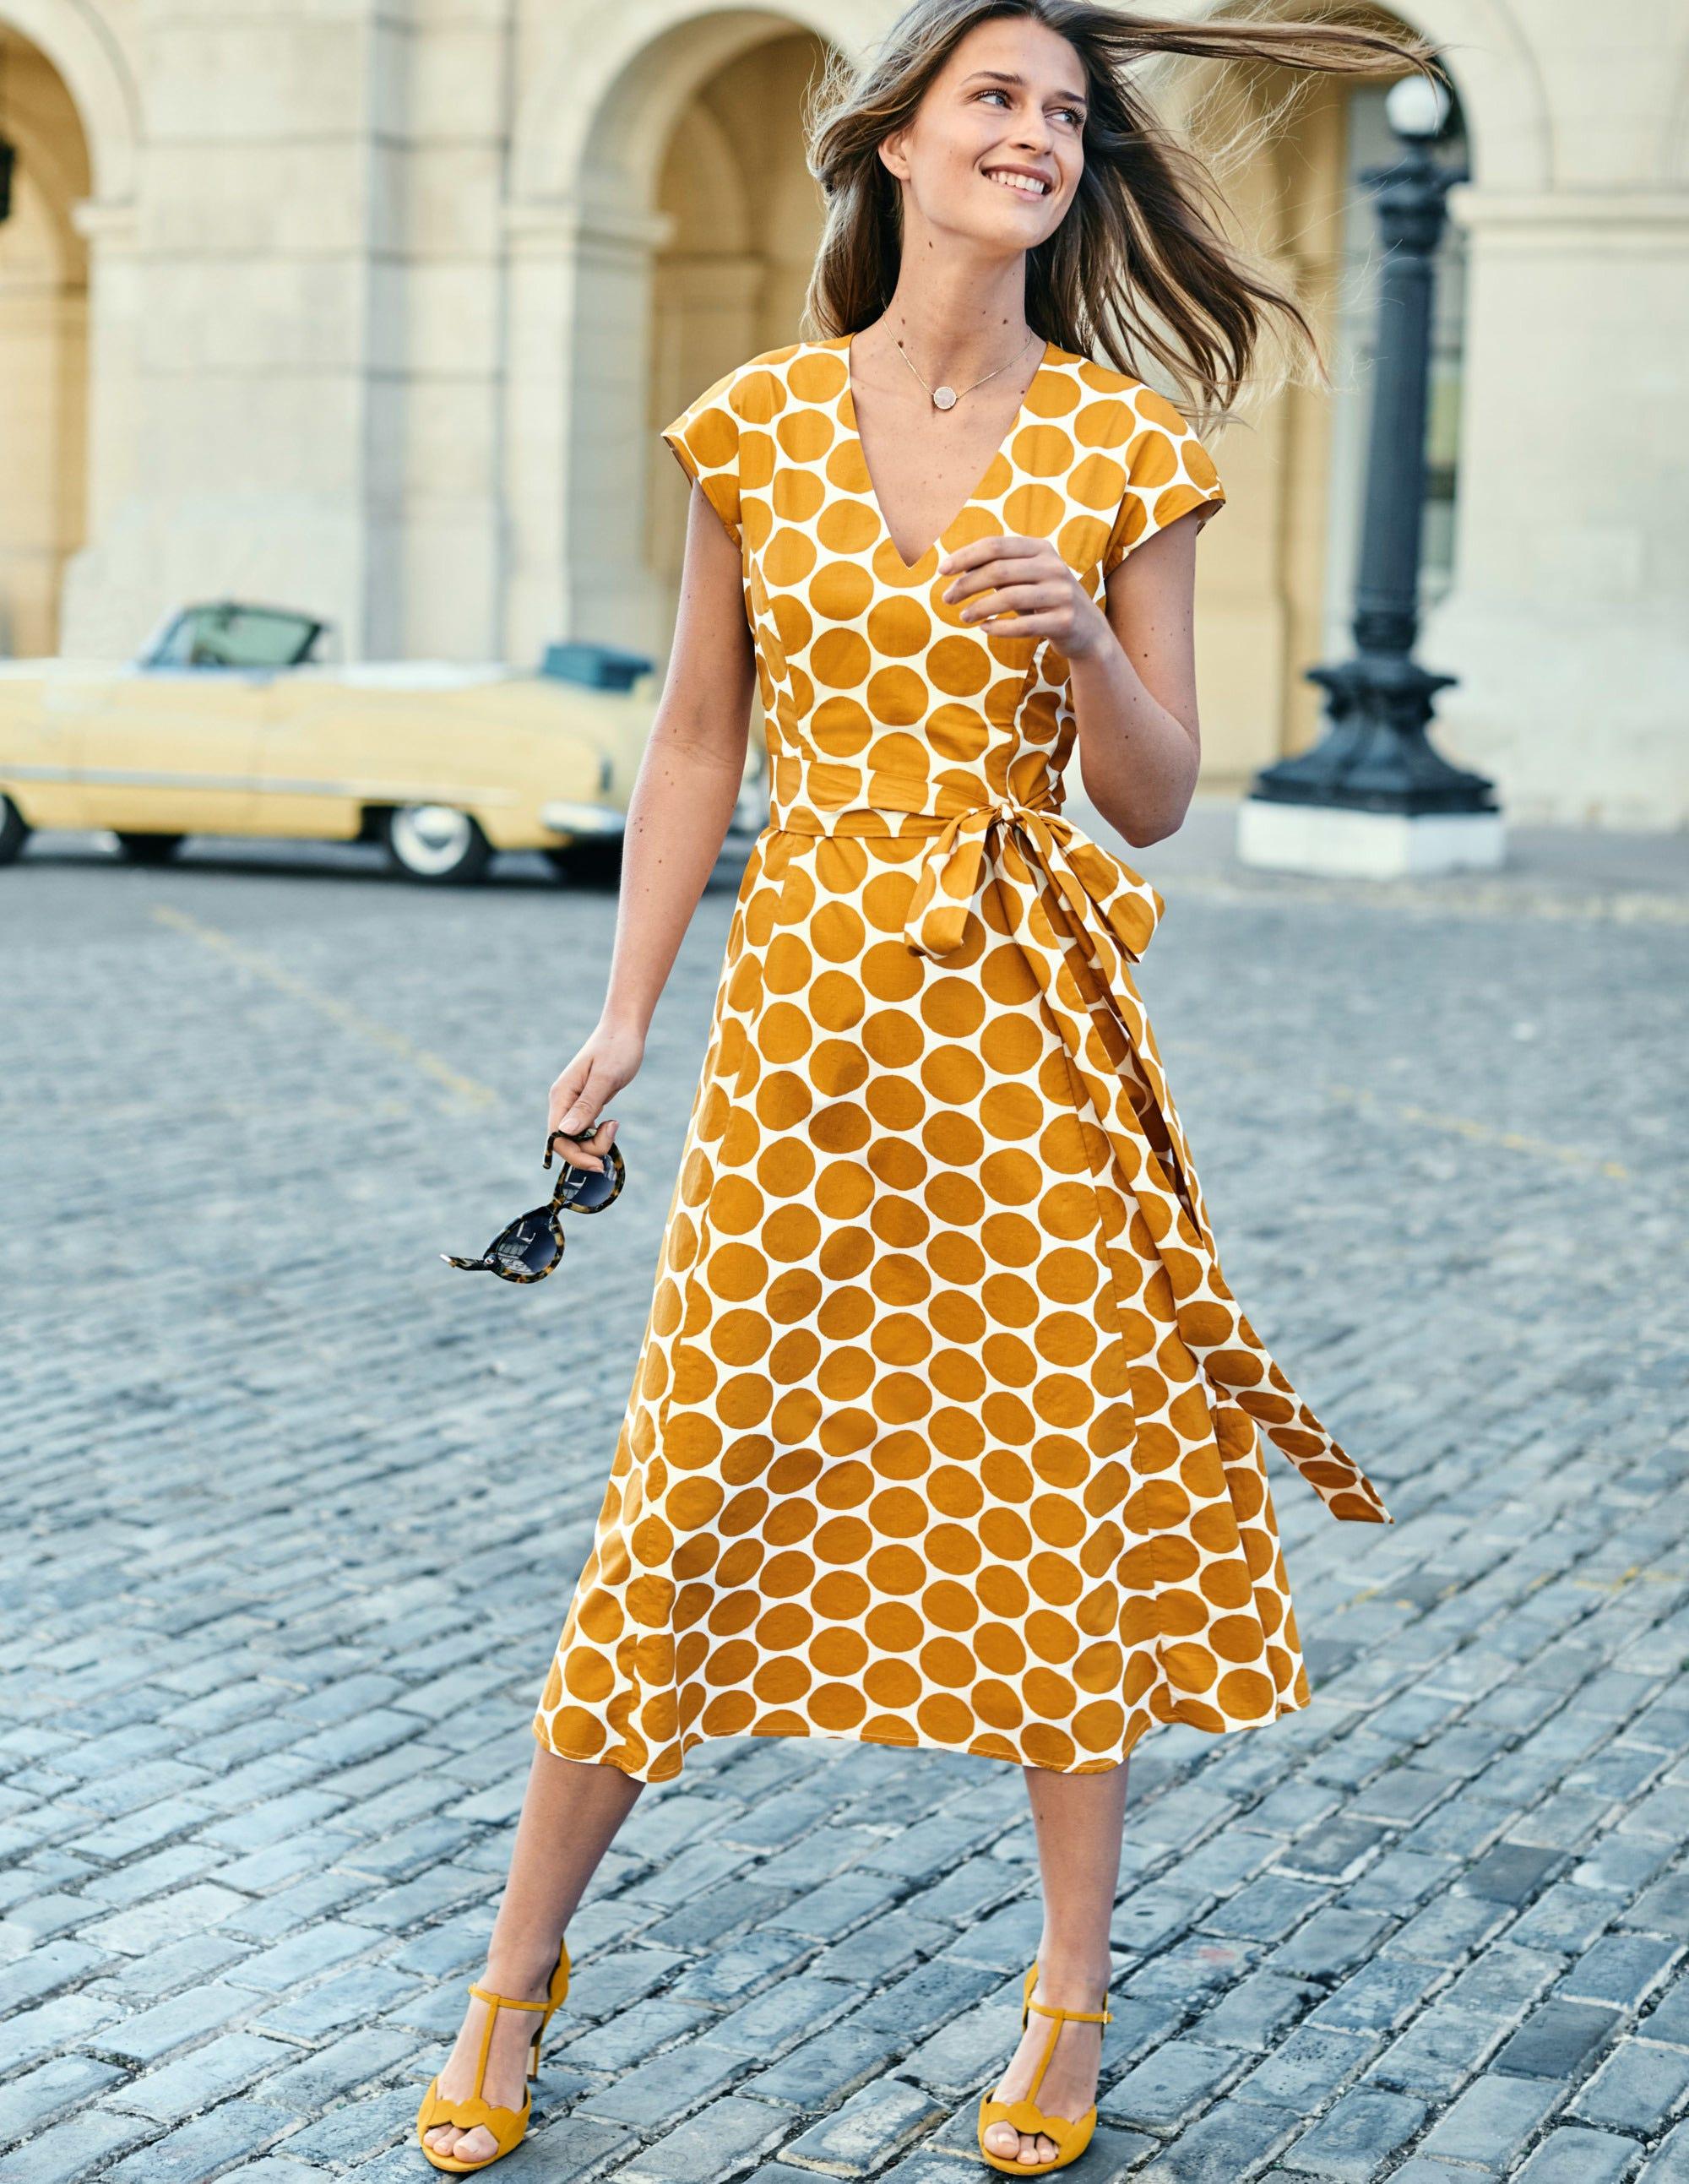 Boden Tori Midi Dress - Ivory & Yellow Brand Spot